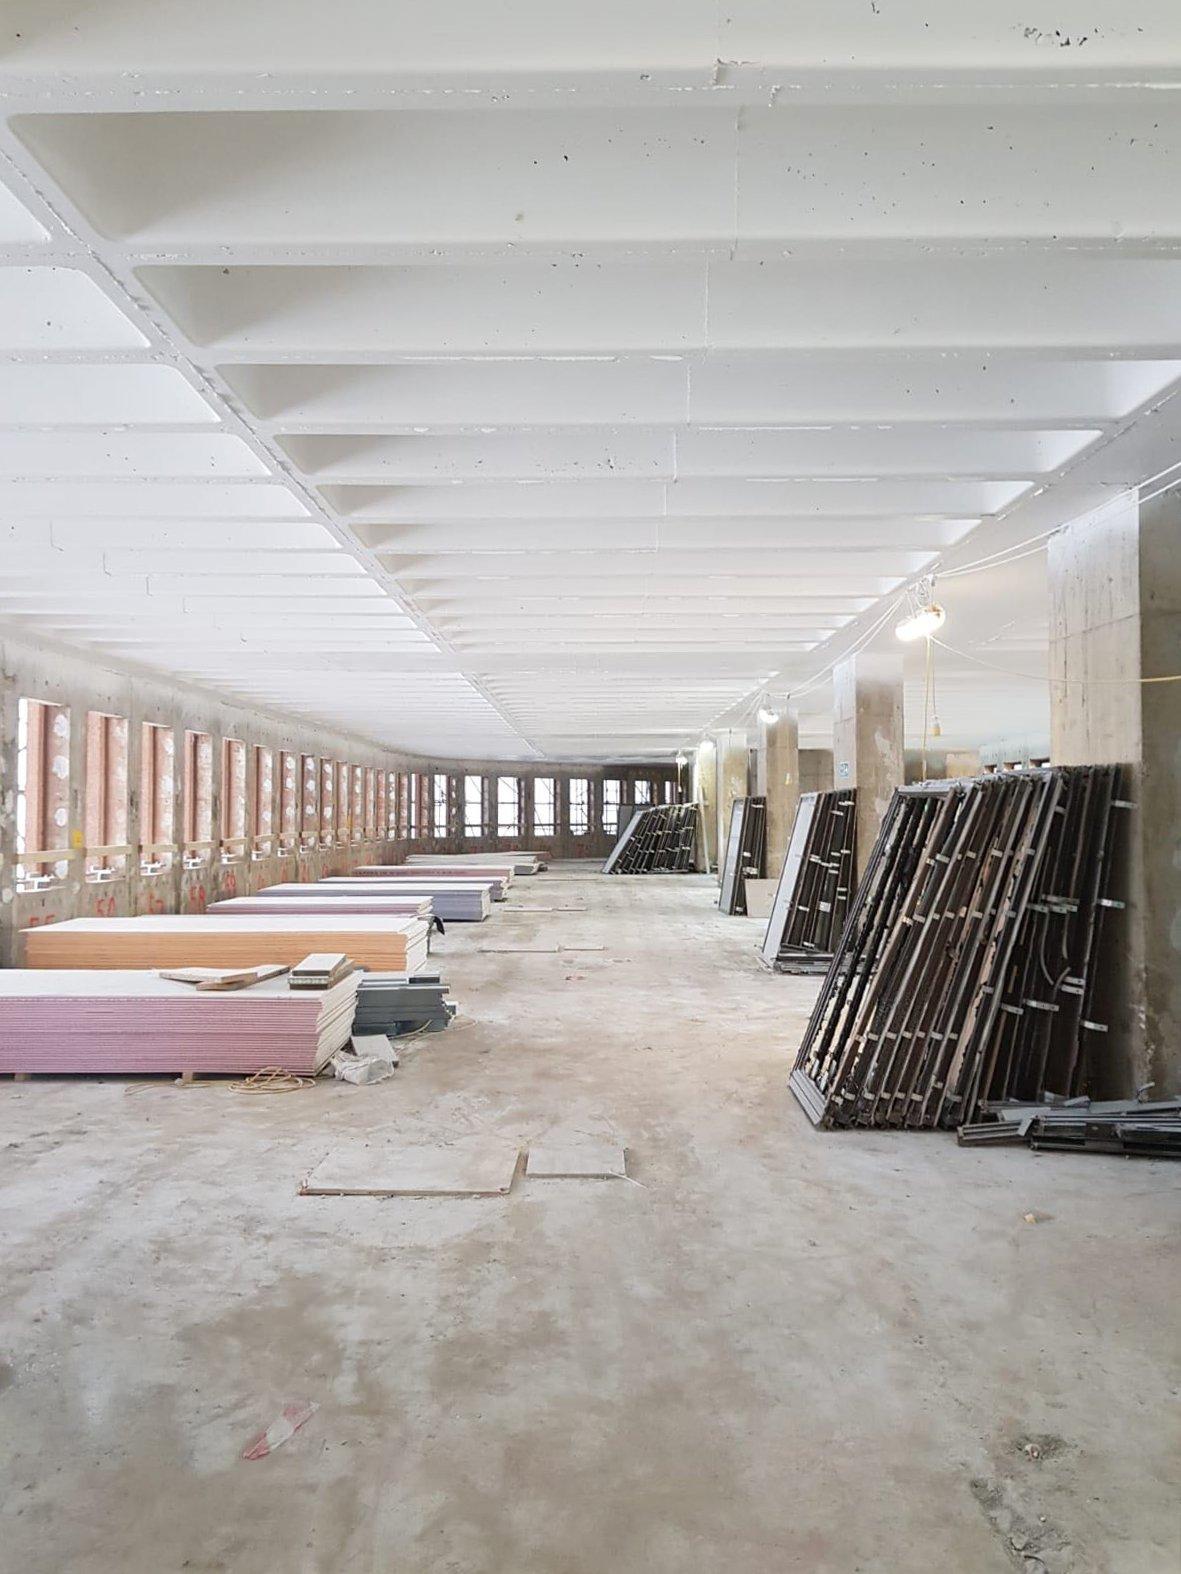 Aithon-A90H-Concrete-Fire-Protection-Minories-Hotel-ATOL